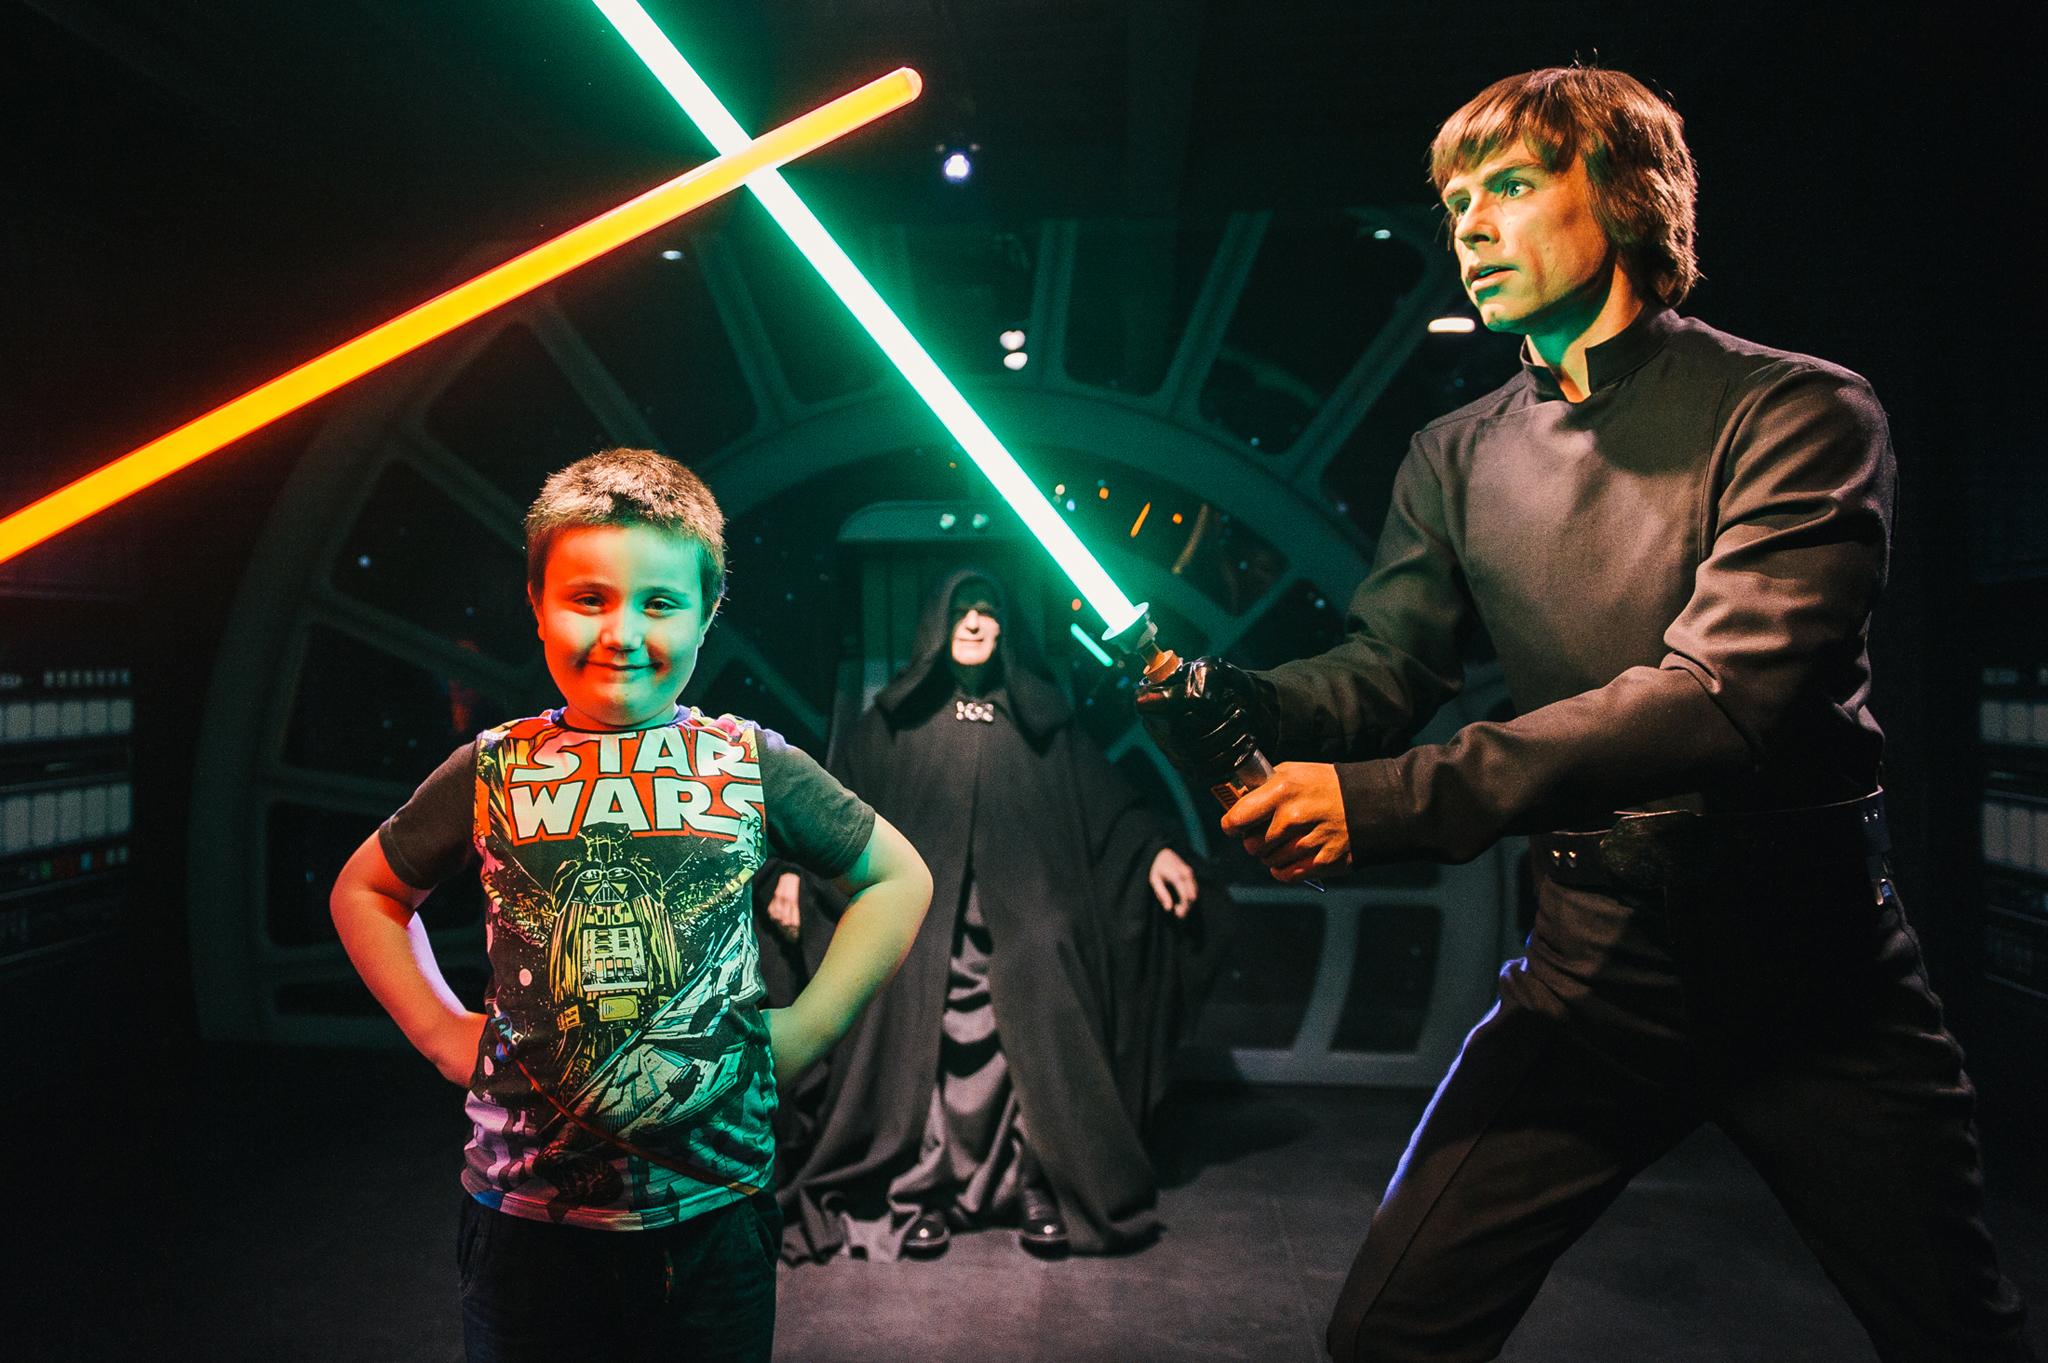 Star Wars at Madame Tussauds